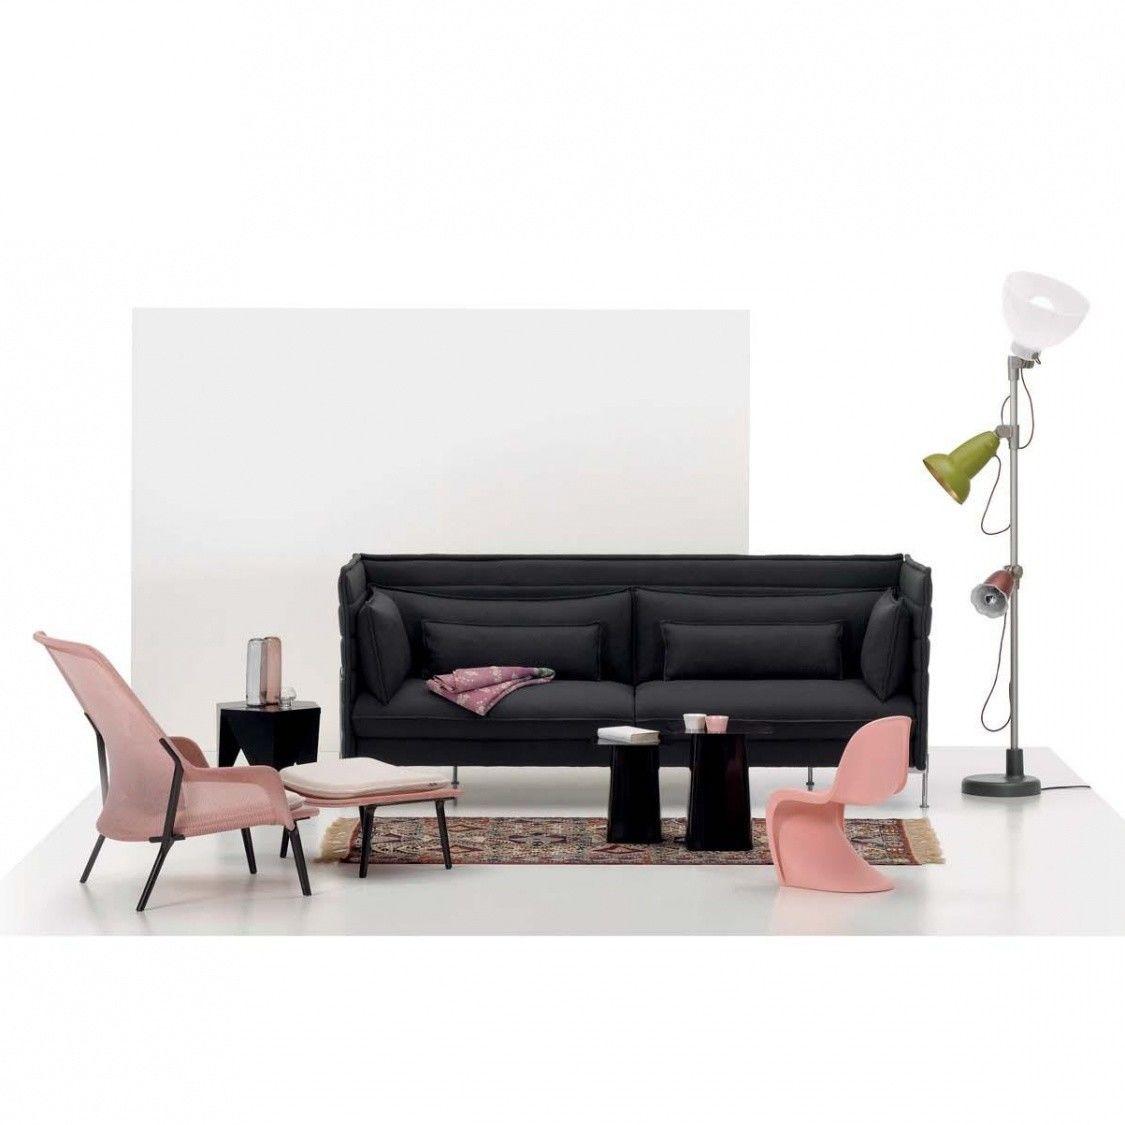 panton junior kinderstuhl vitra. Black Bedroom Furniture Sets. Home Design Ideas